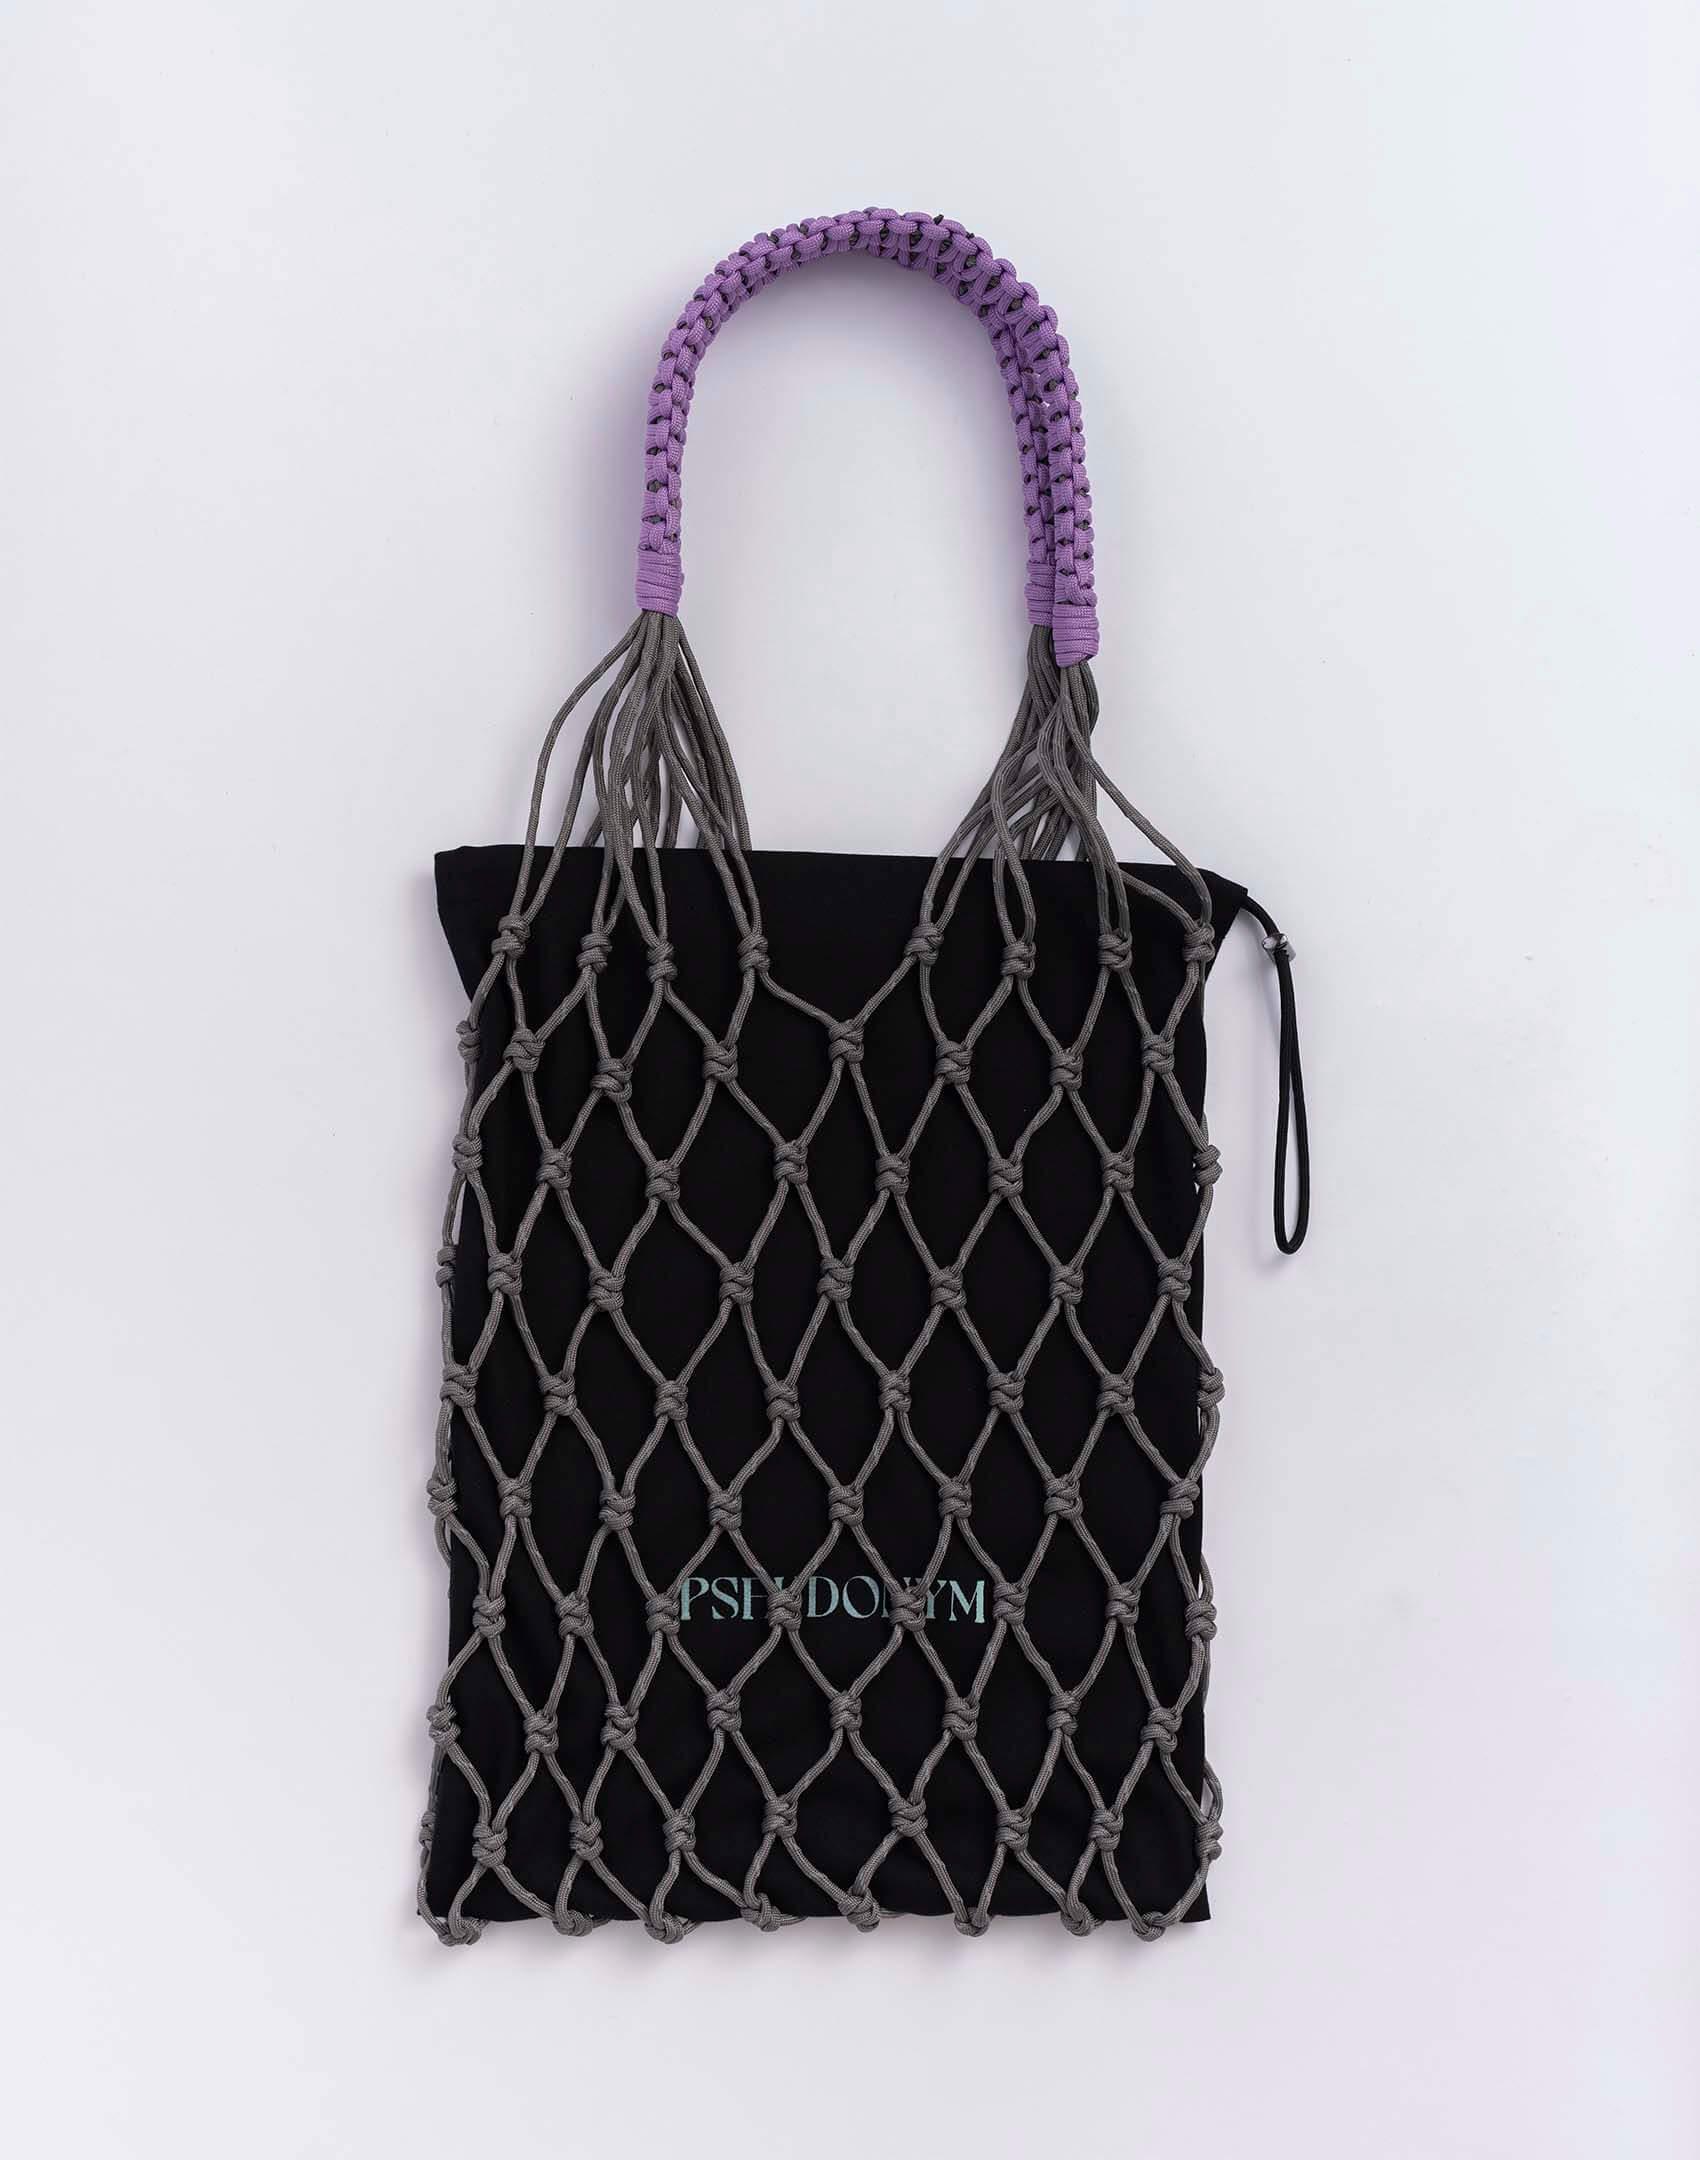 P.S. Field Bag 14 (James Baldwin), gray/lilac colorway.